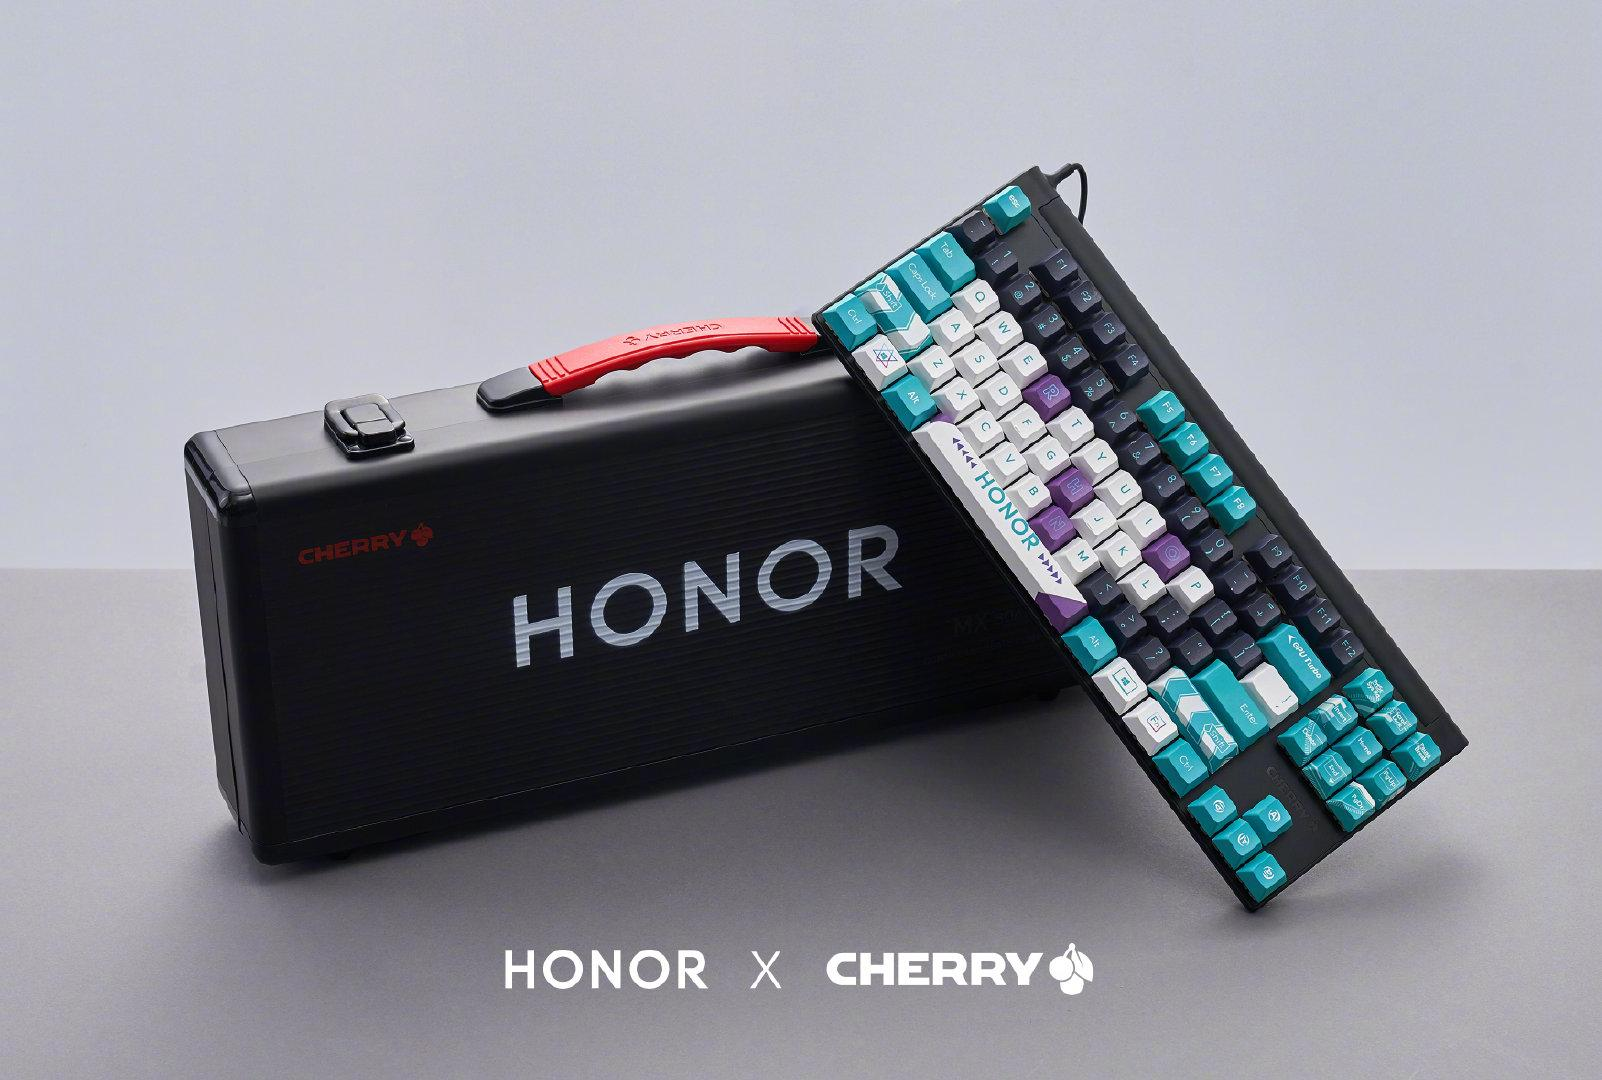 Honor продастмеханическую клавиатуру спереключателями Cherry